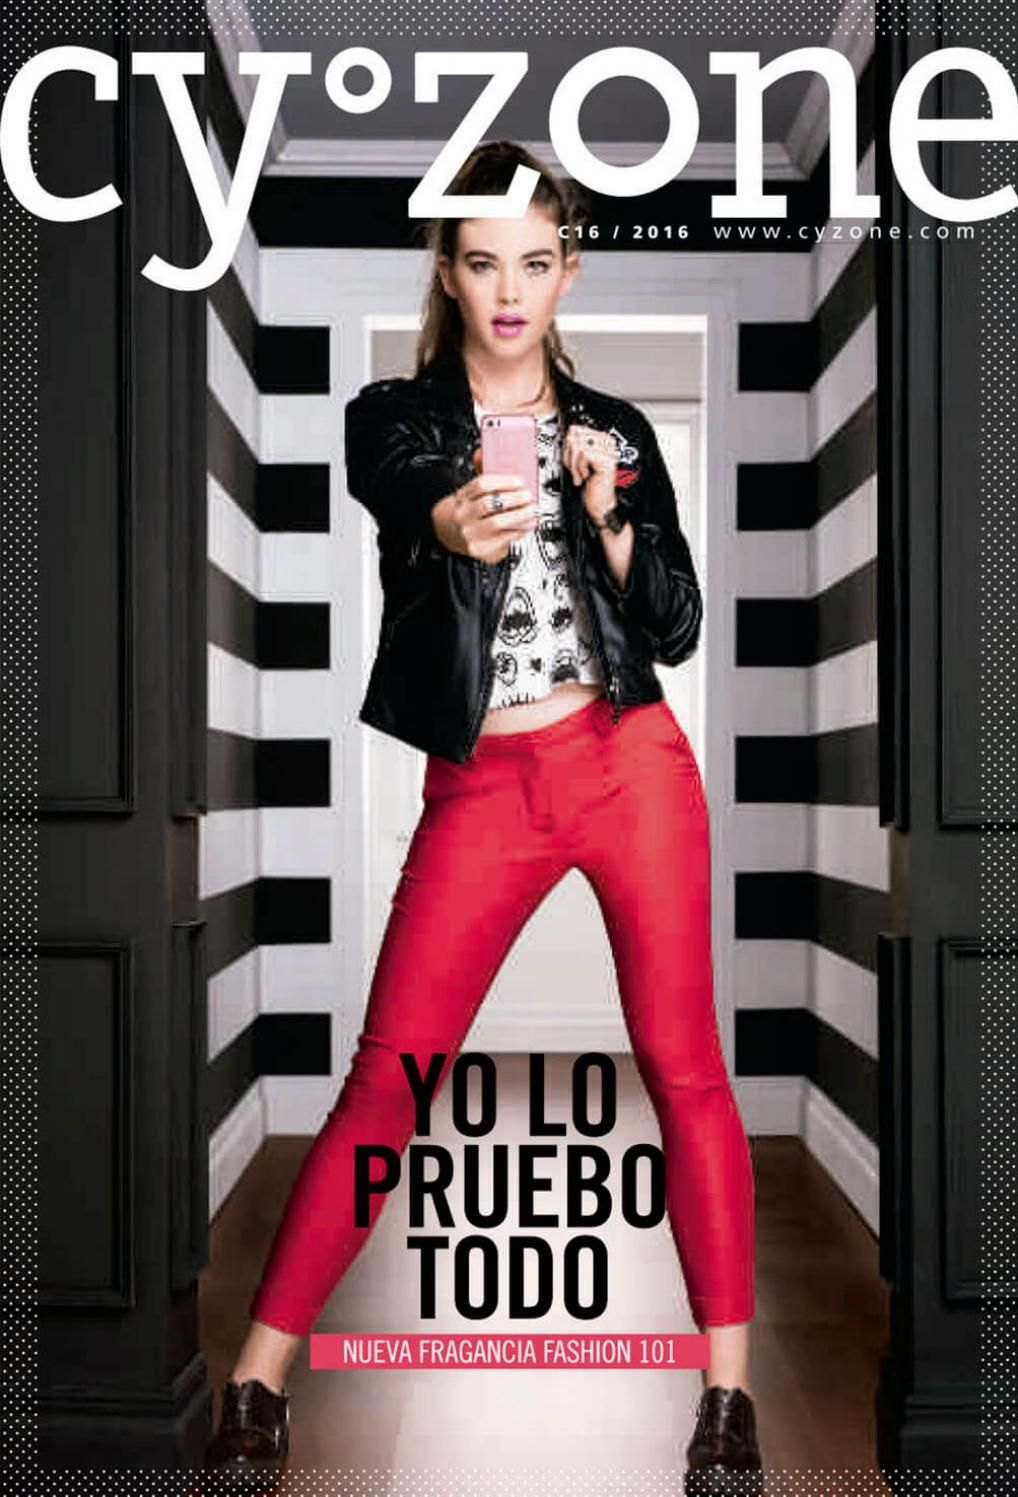 Catalogo Cyzone Ecuador C16 Fashion Style Casual